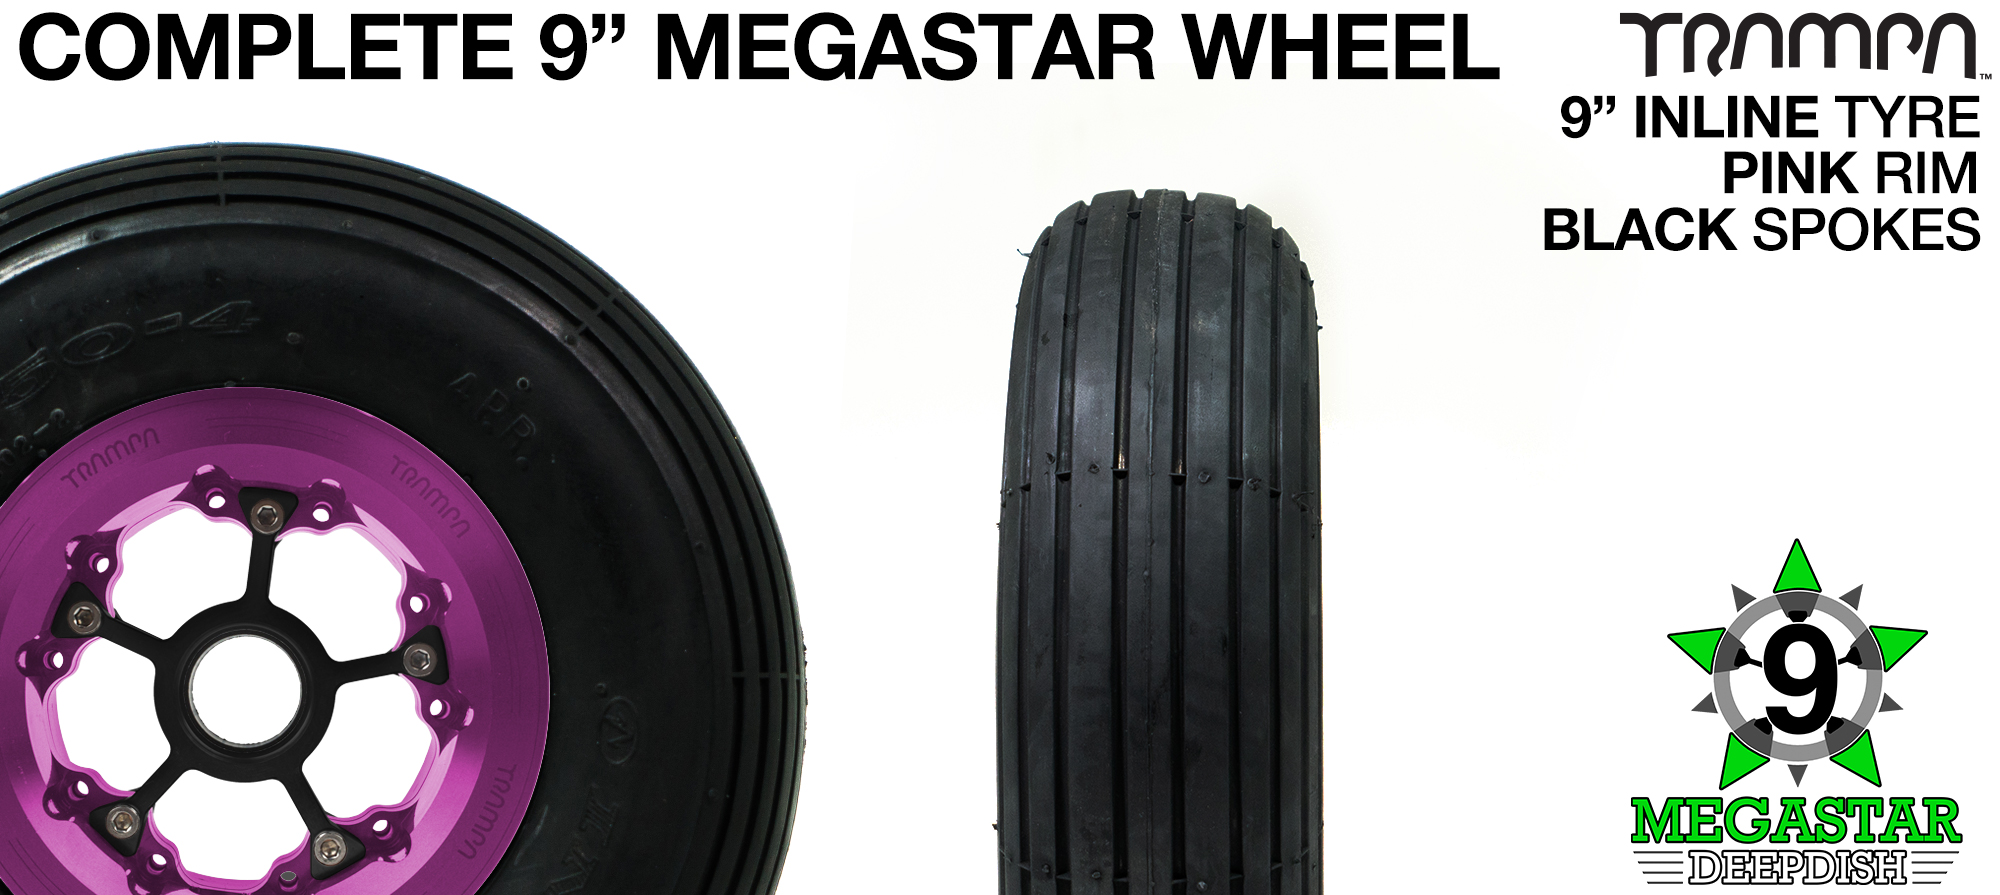 PINK 9 inch Deep-Dish MEGASTARS Rim with BLACK Spokes & 9 Inch INLINE Tyre